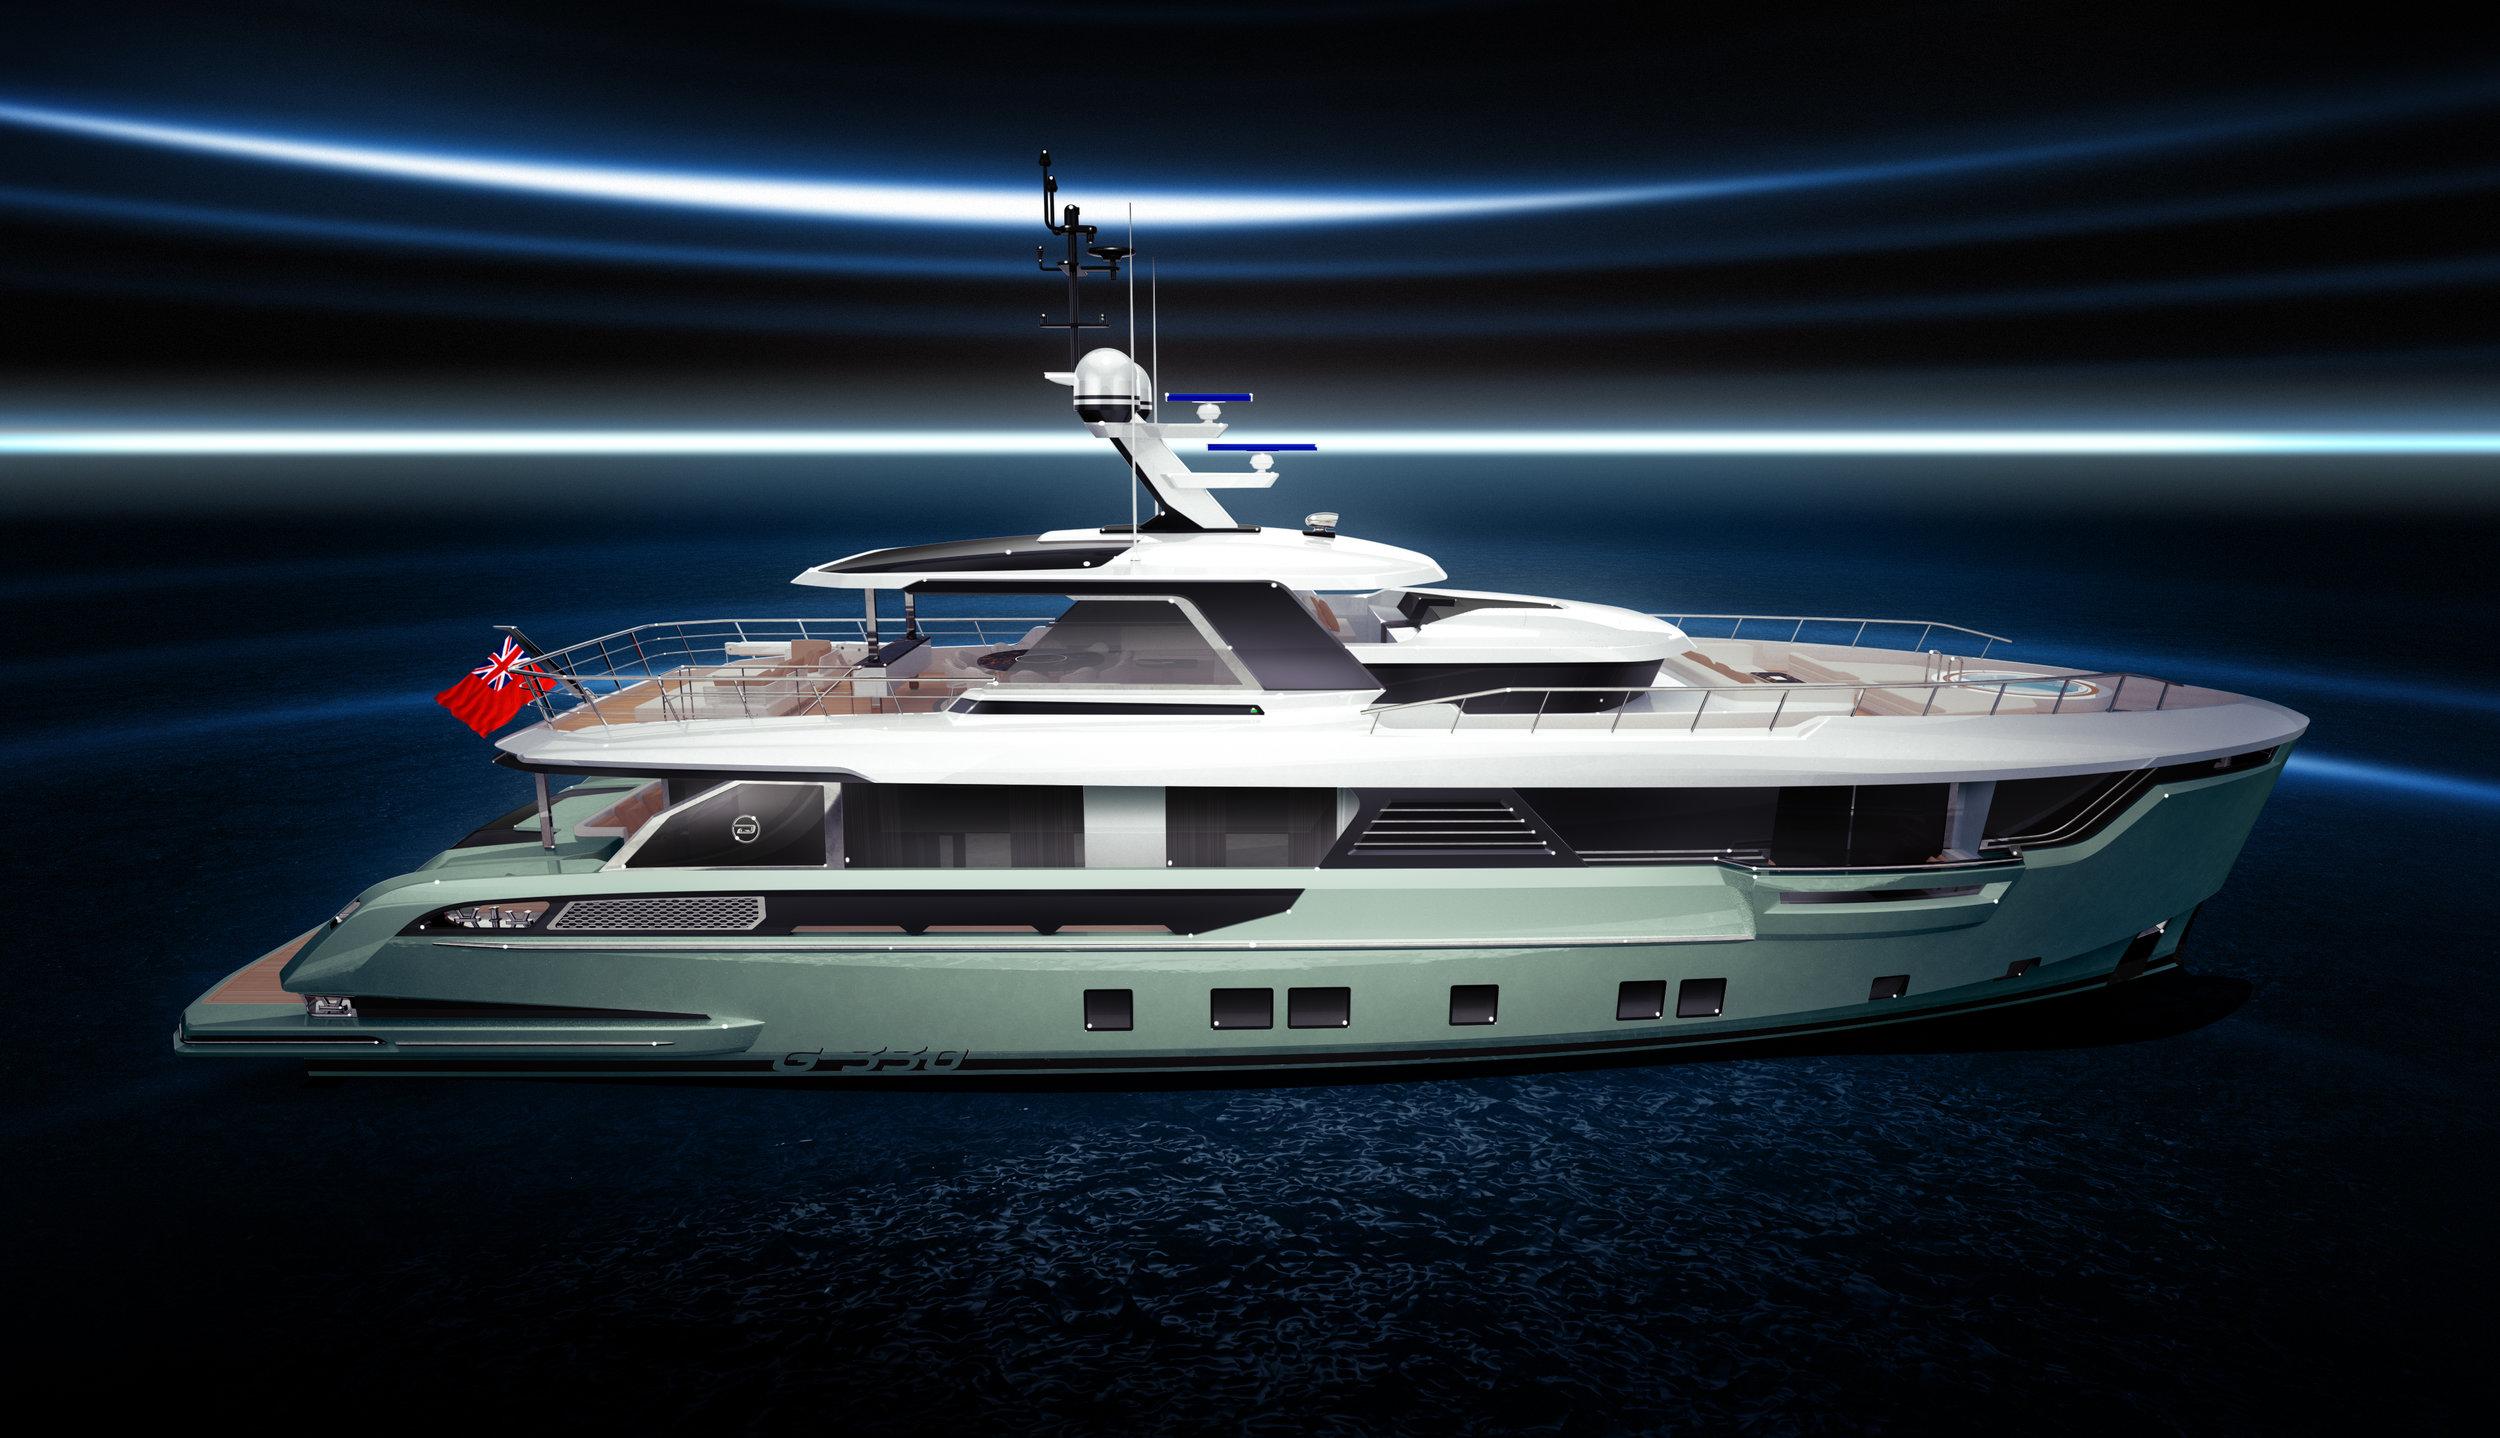 Dynamiq G 330 Exterior by Dobroserdov Design 2.jpg